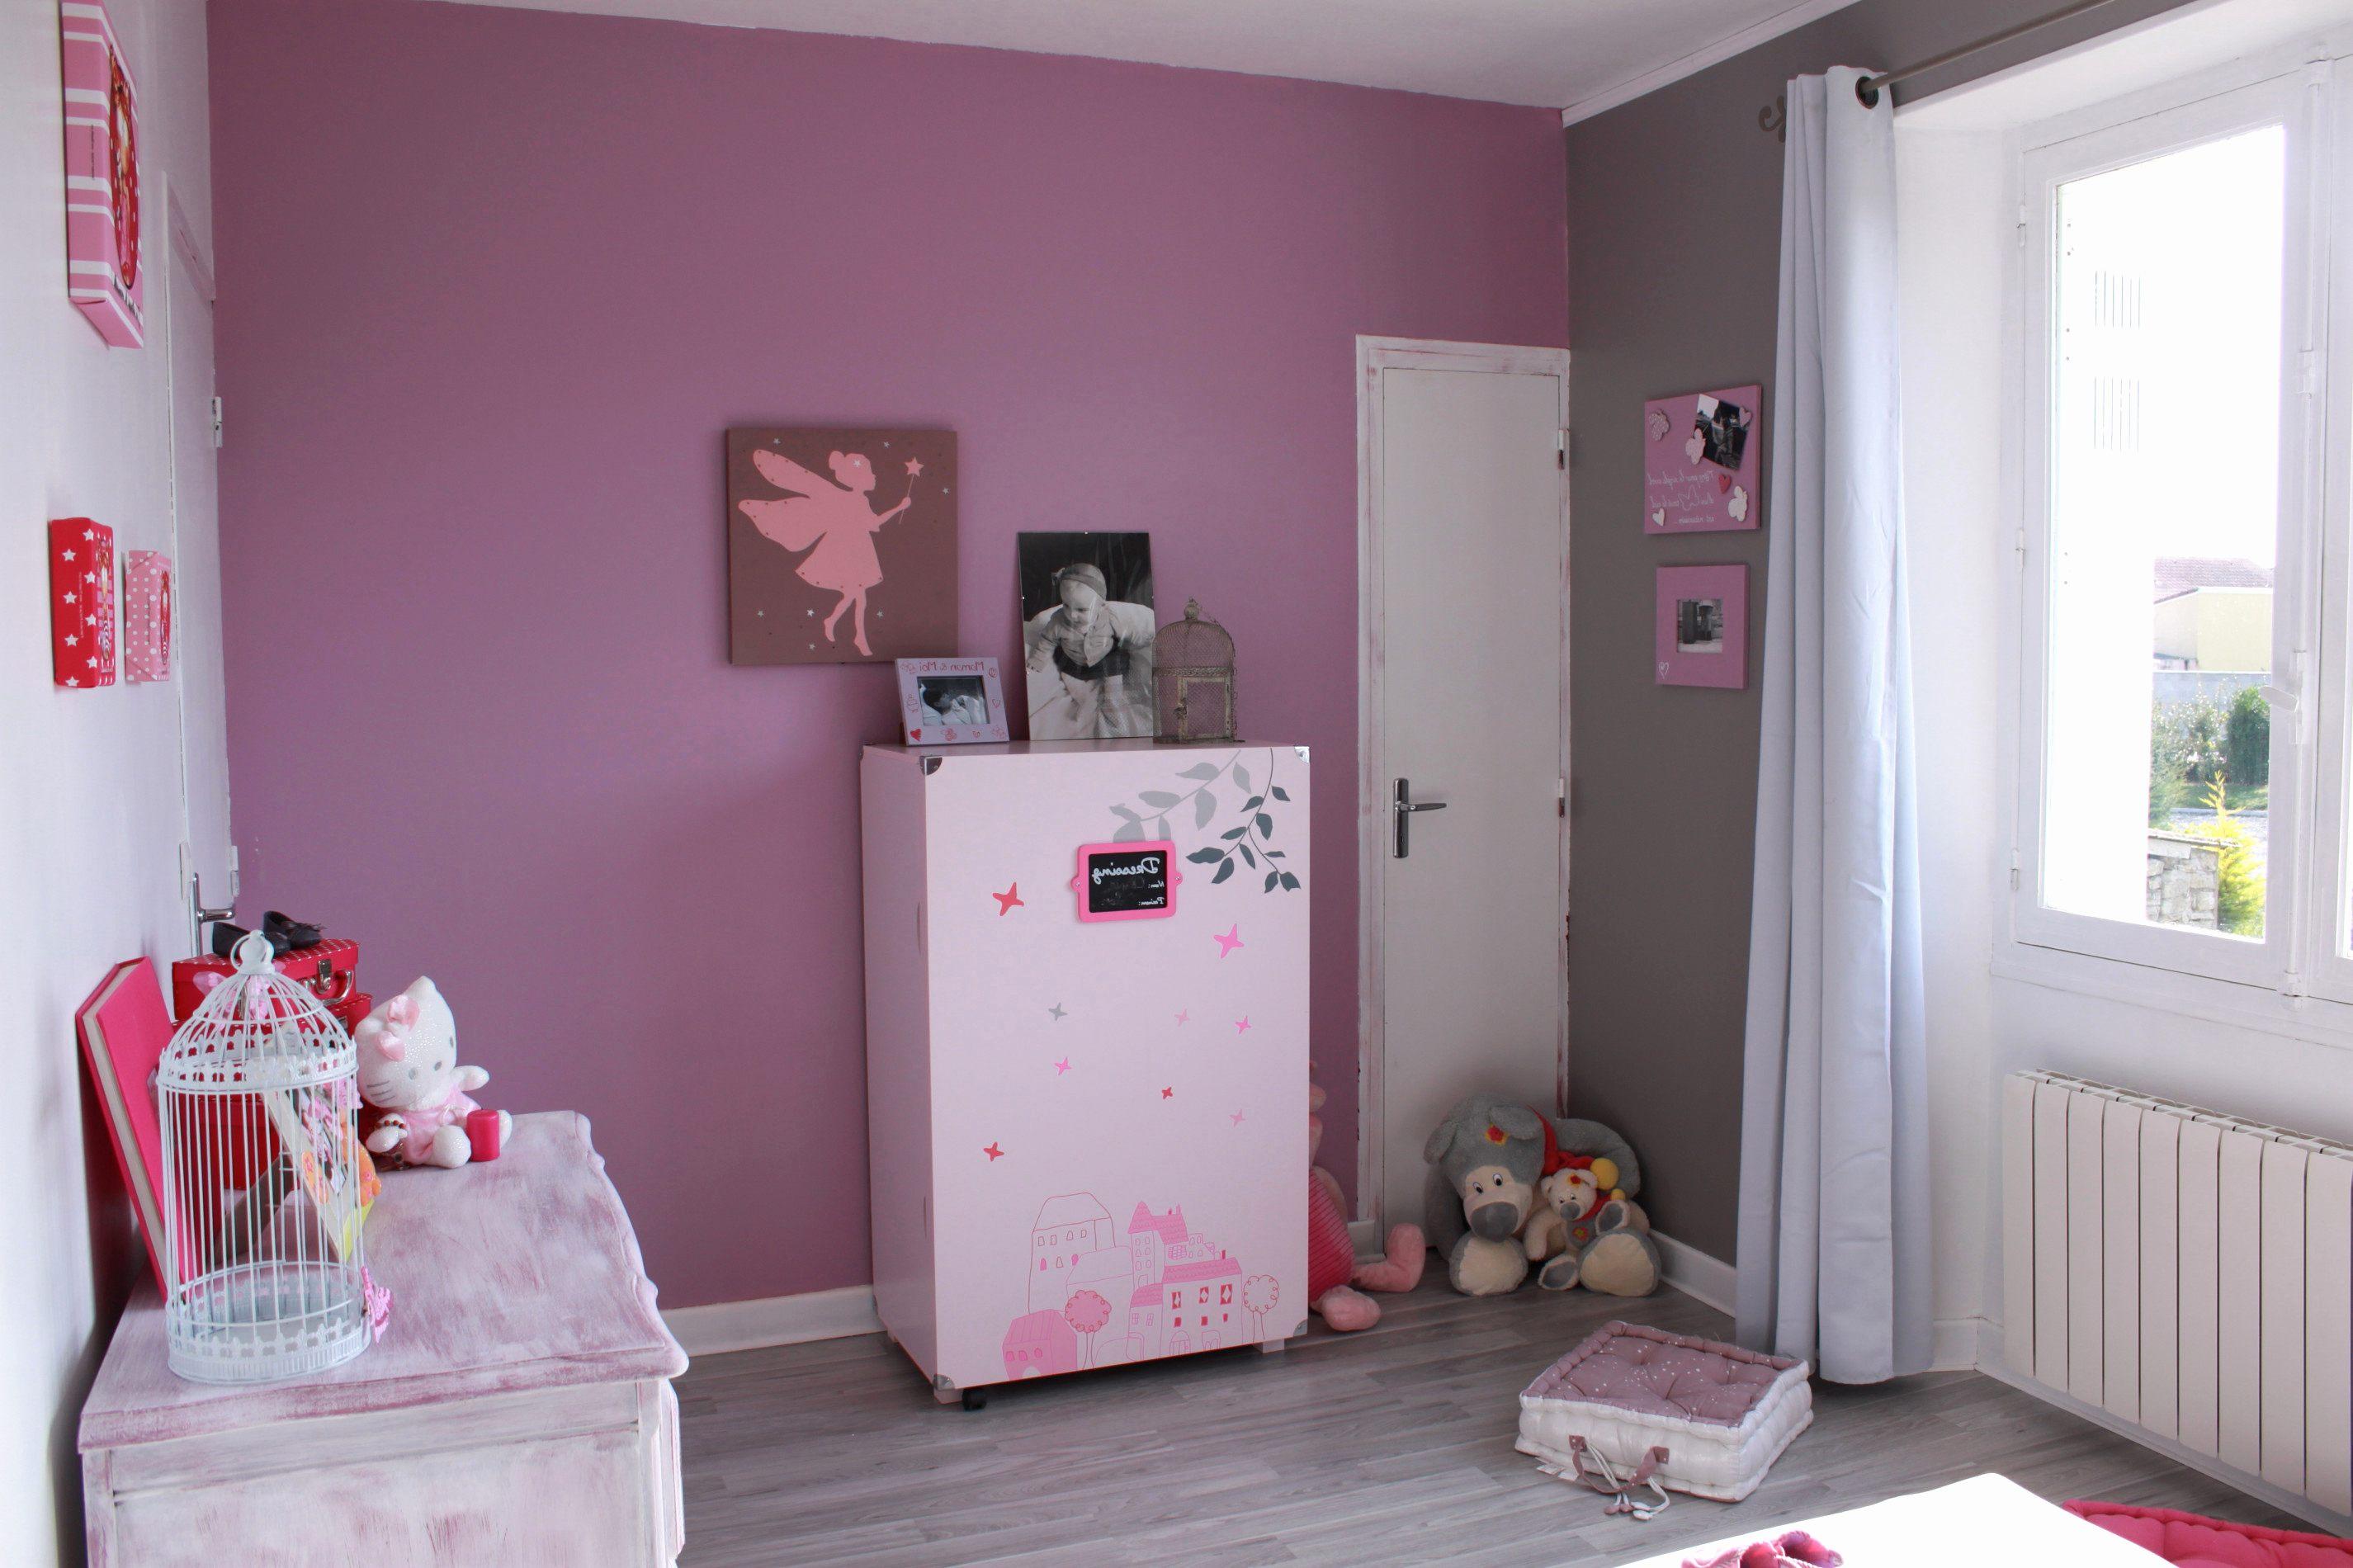 Chicco Lit Bebe Génial Chaise Haute Bebe solde Download Chaise Haute 3 En 1 Chicco – Ccfd